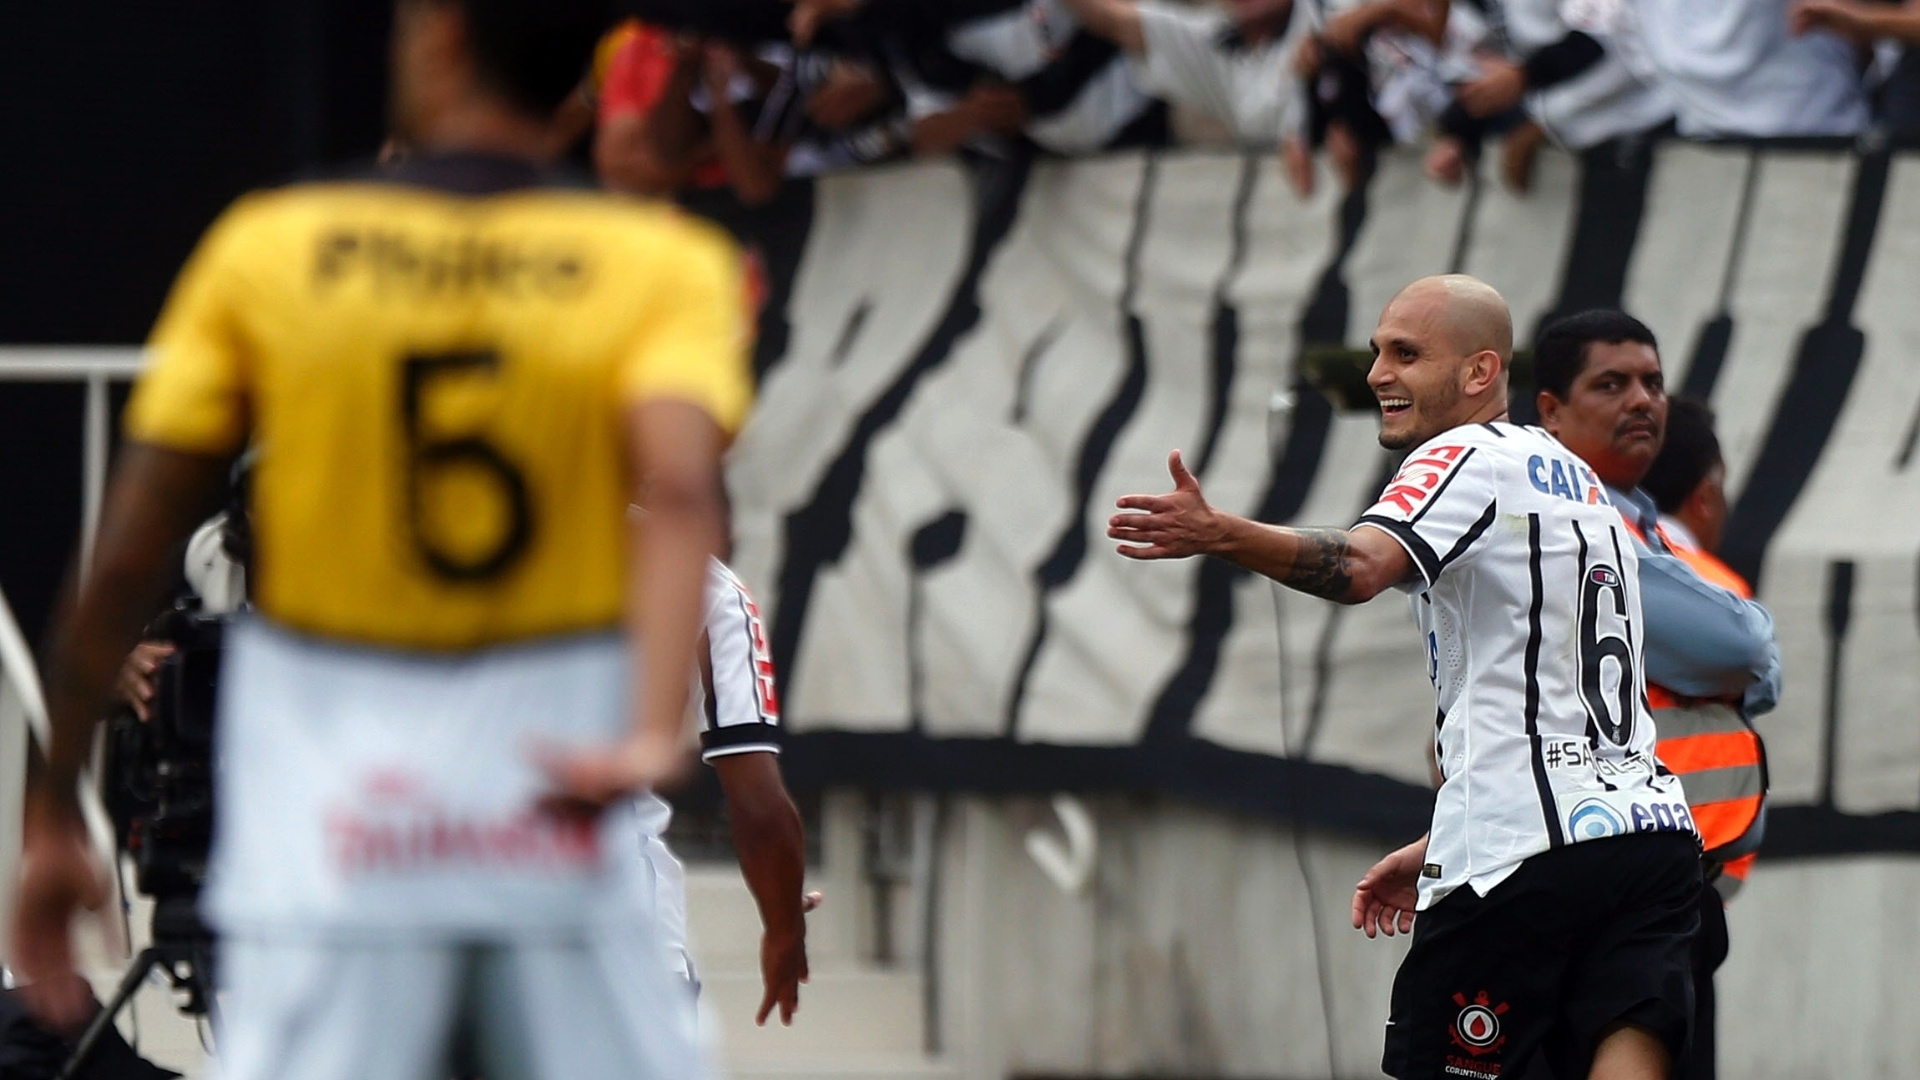 Fábio Santos comemora segundo gol do Corinthians contra o Criciúma